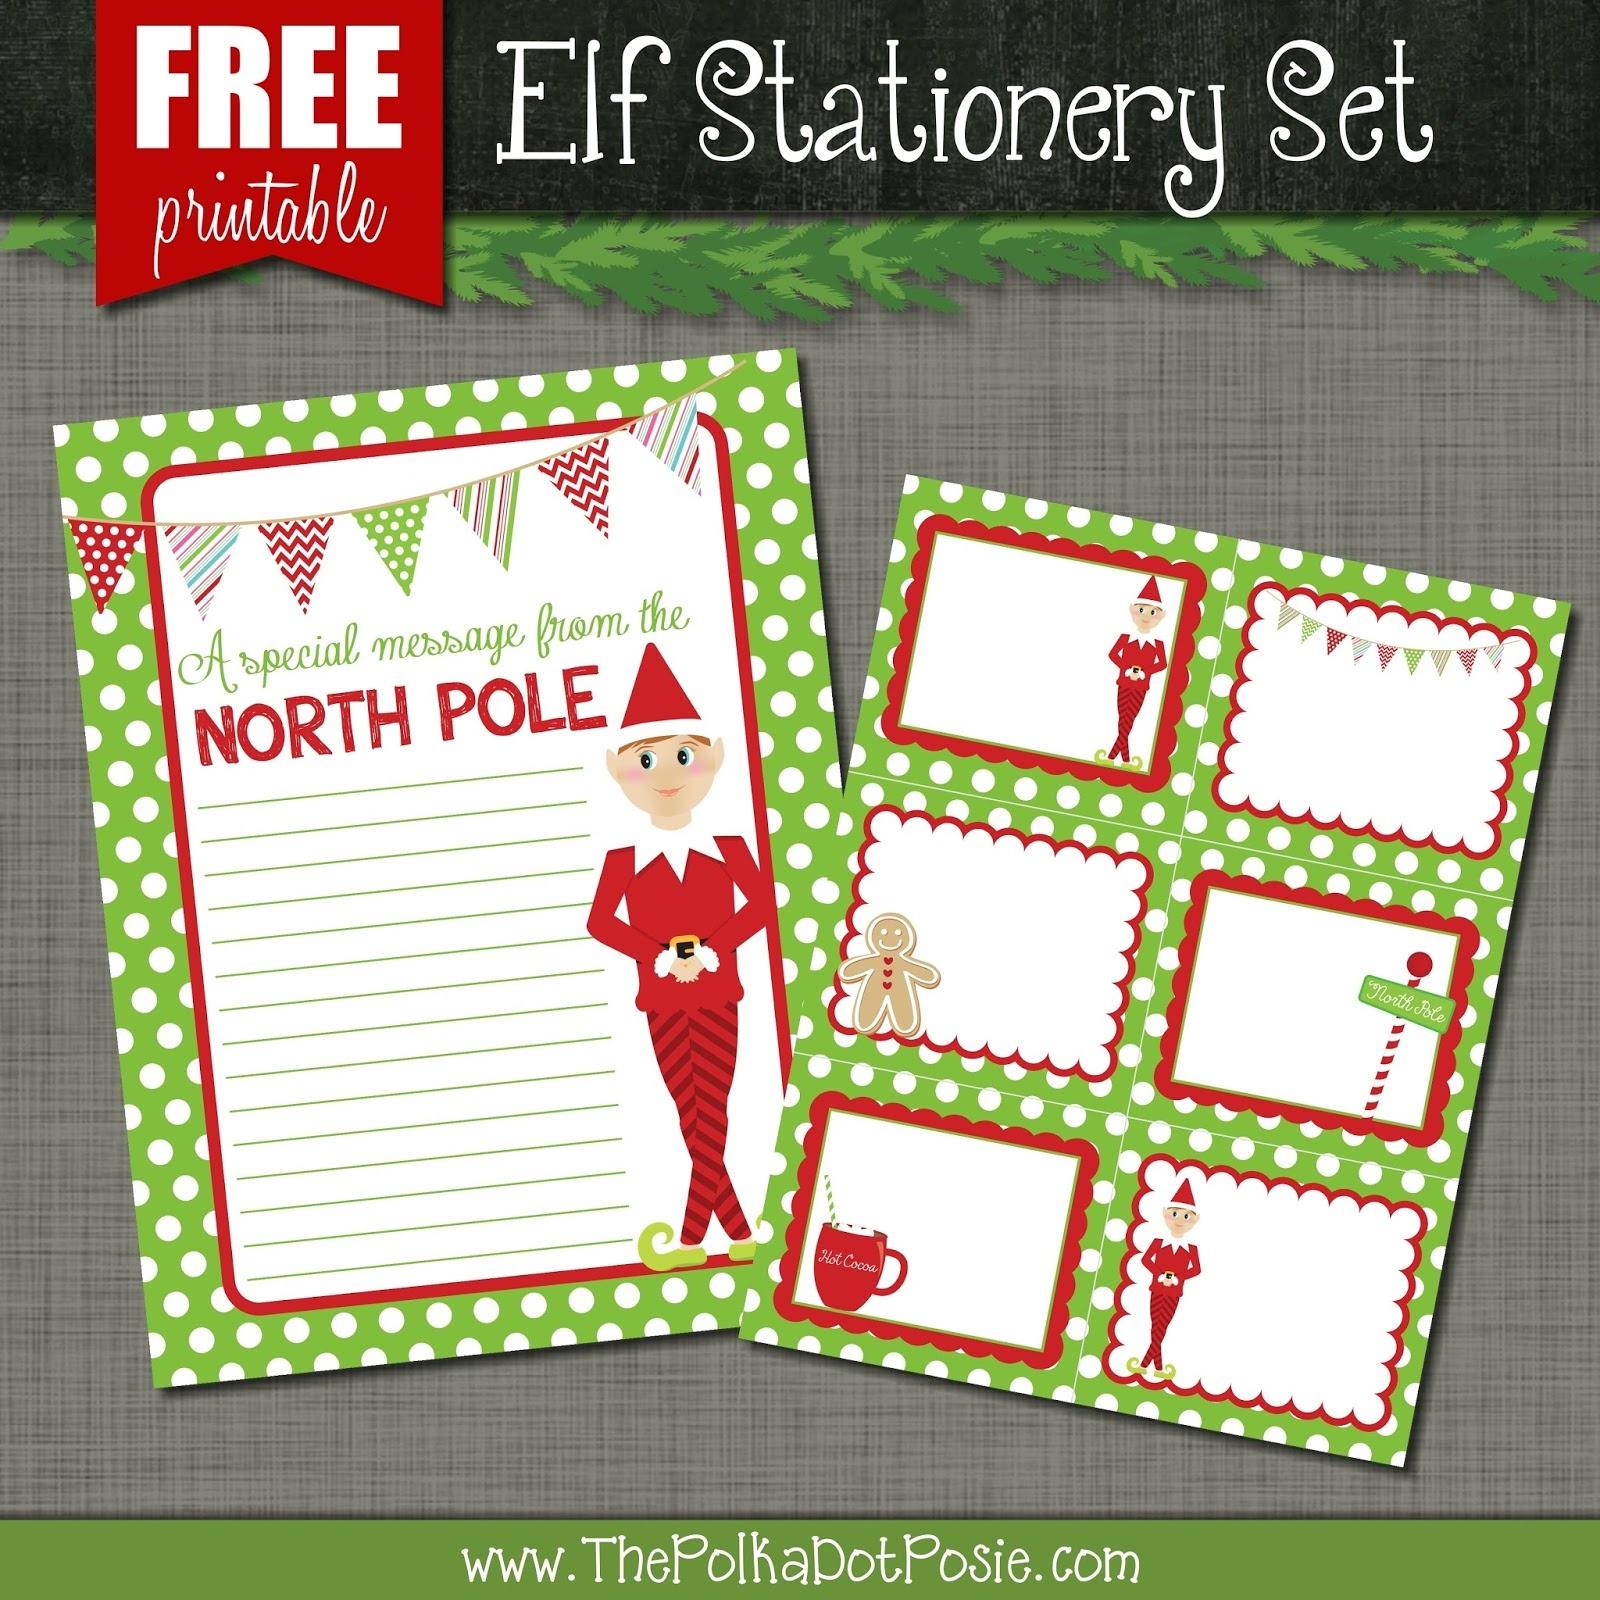 The Polka Dot Posie: Free Printables For Your Christmas Elf - Free Printable Elf Stationery